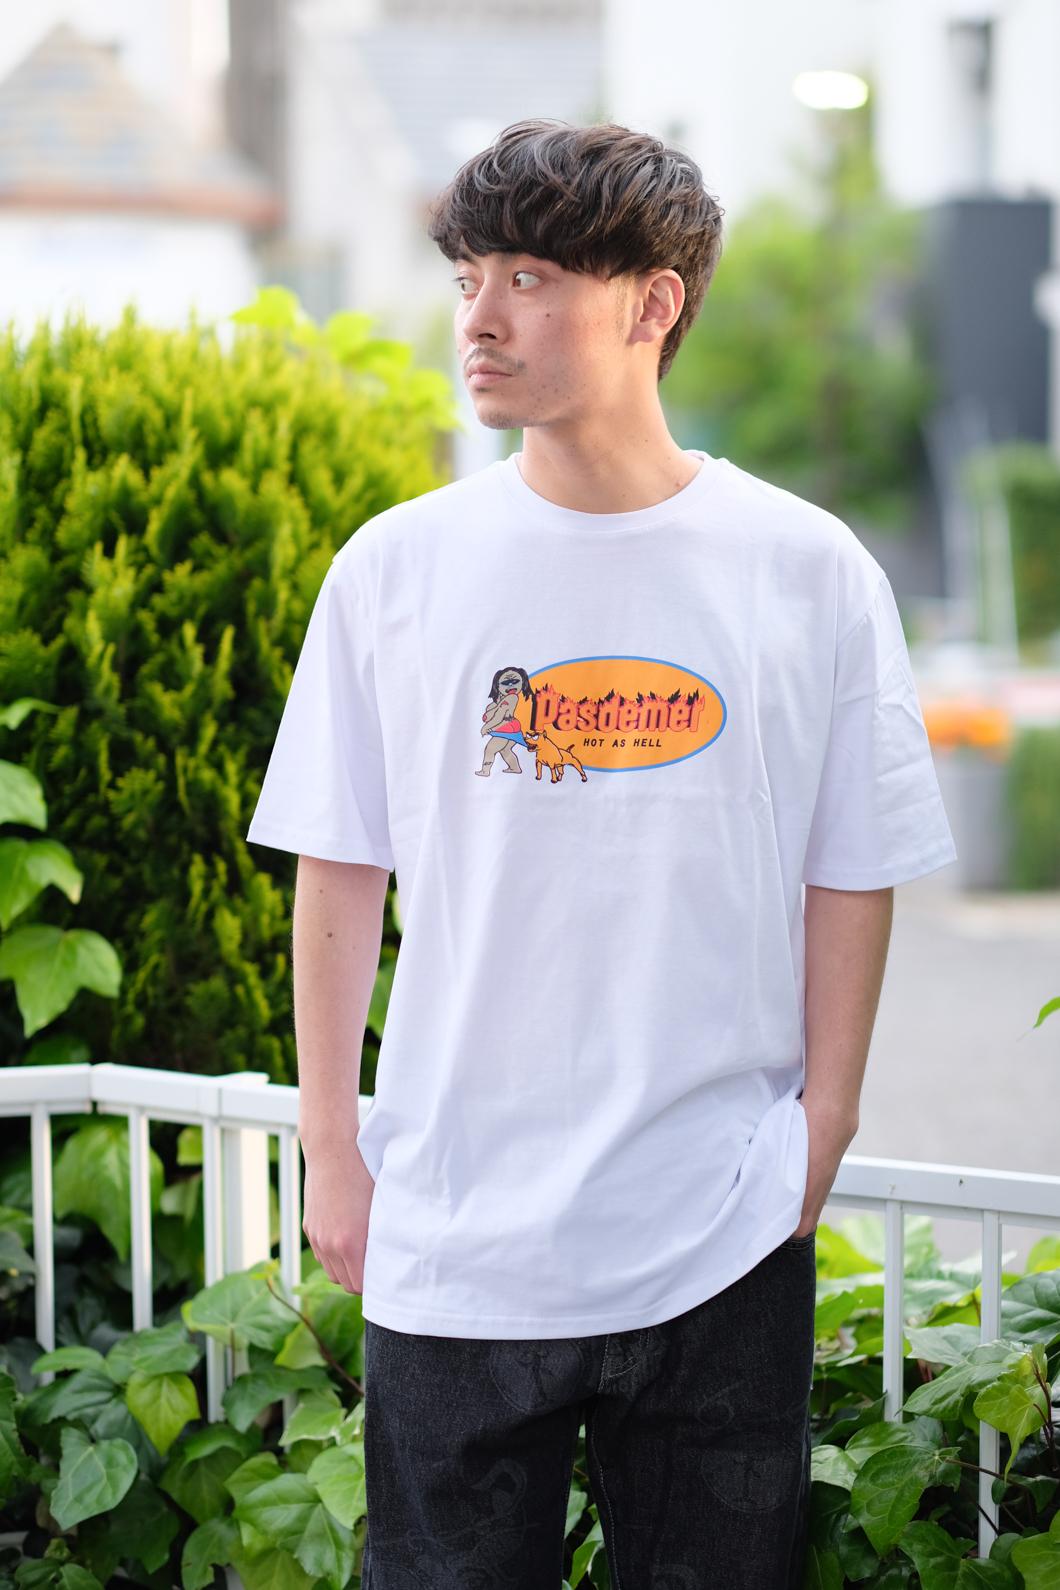 【PAS DE MER/パドゥメ】HOT AS HELL T-SHIRT Tシャツ / WHITE